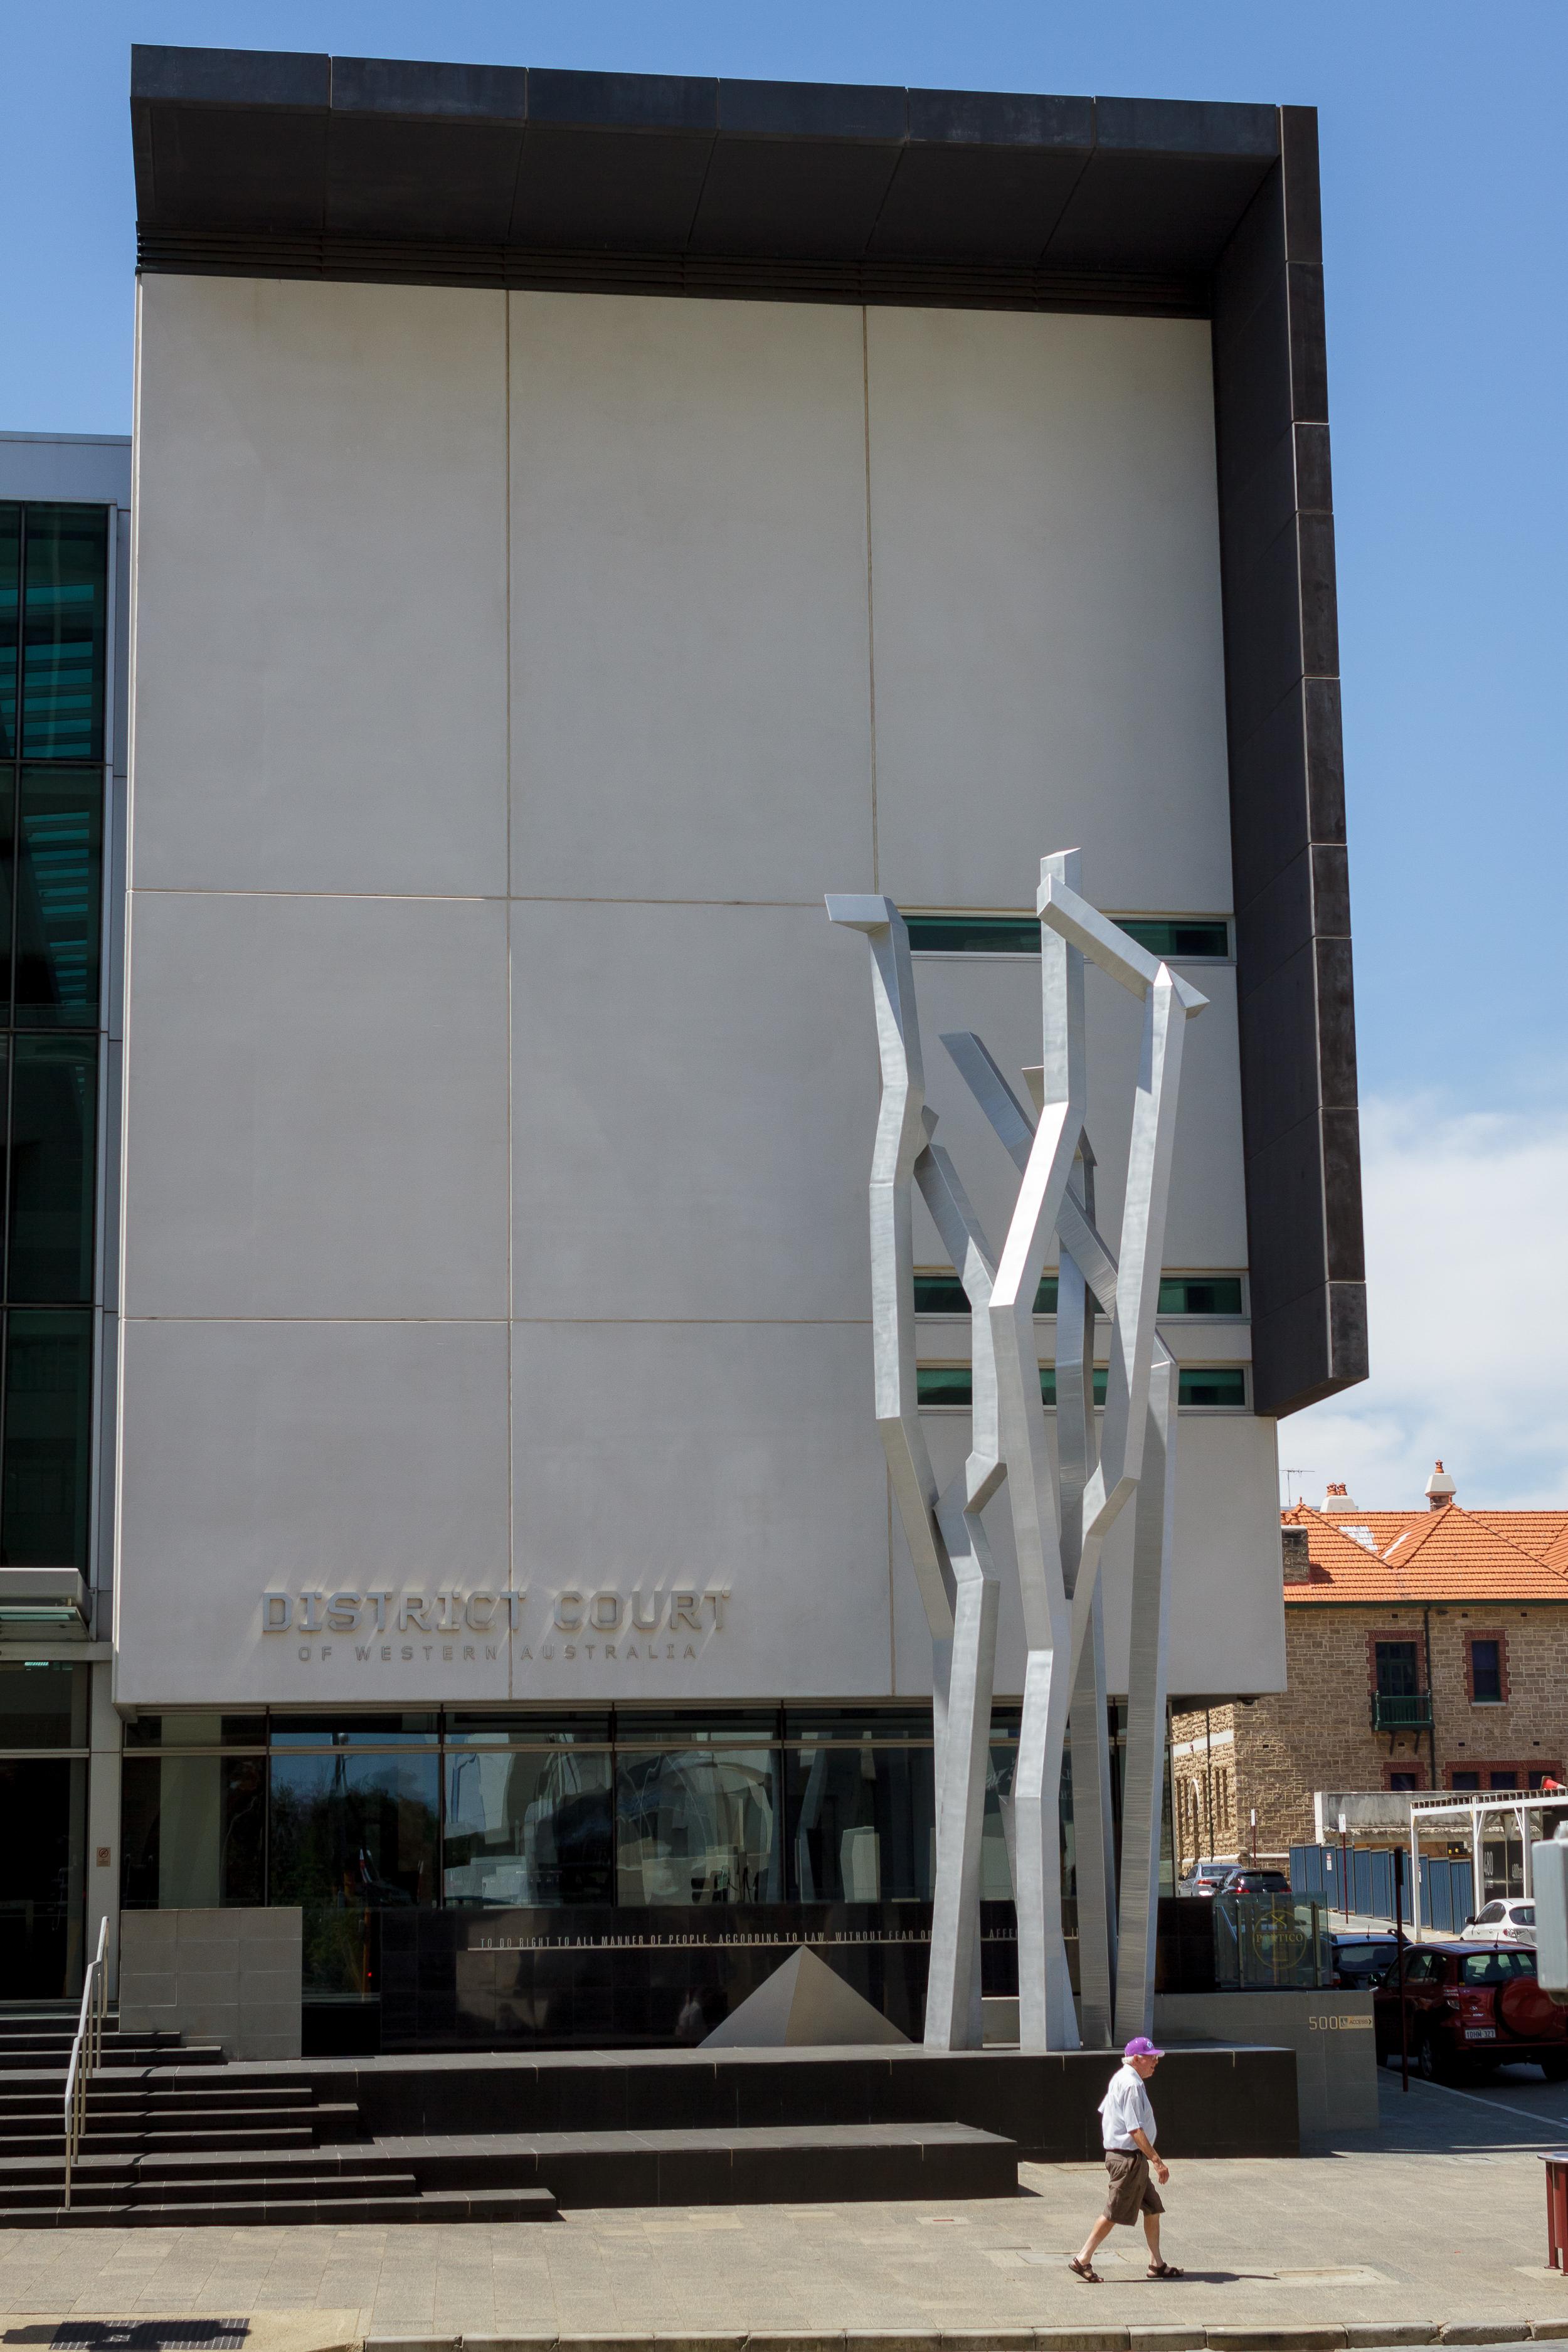 35 mm-20151129-135520-Perth Streets District Court.jpg